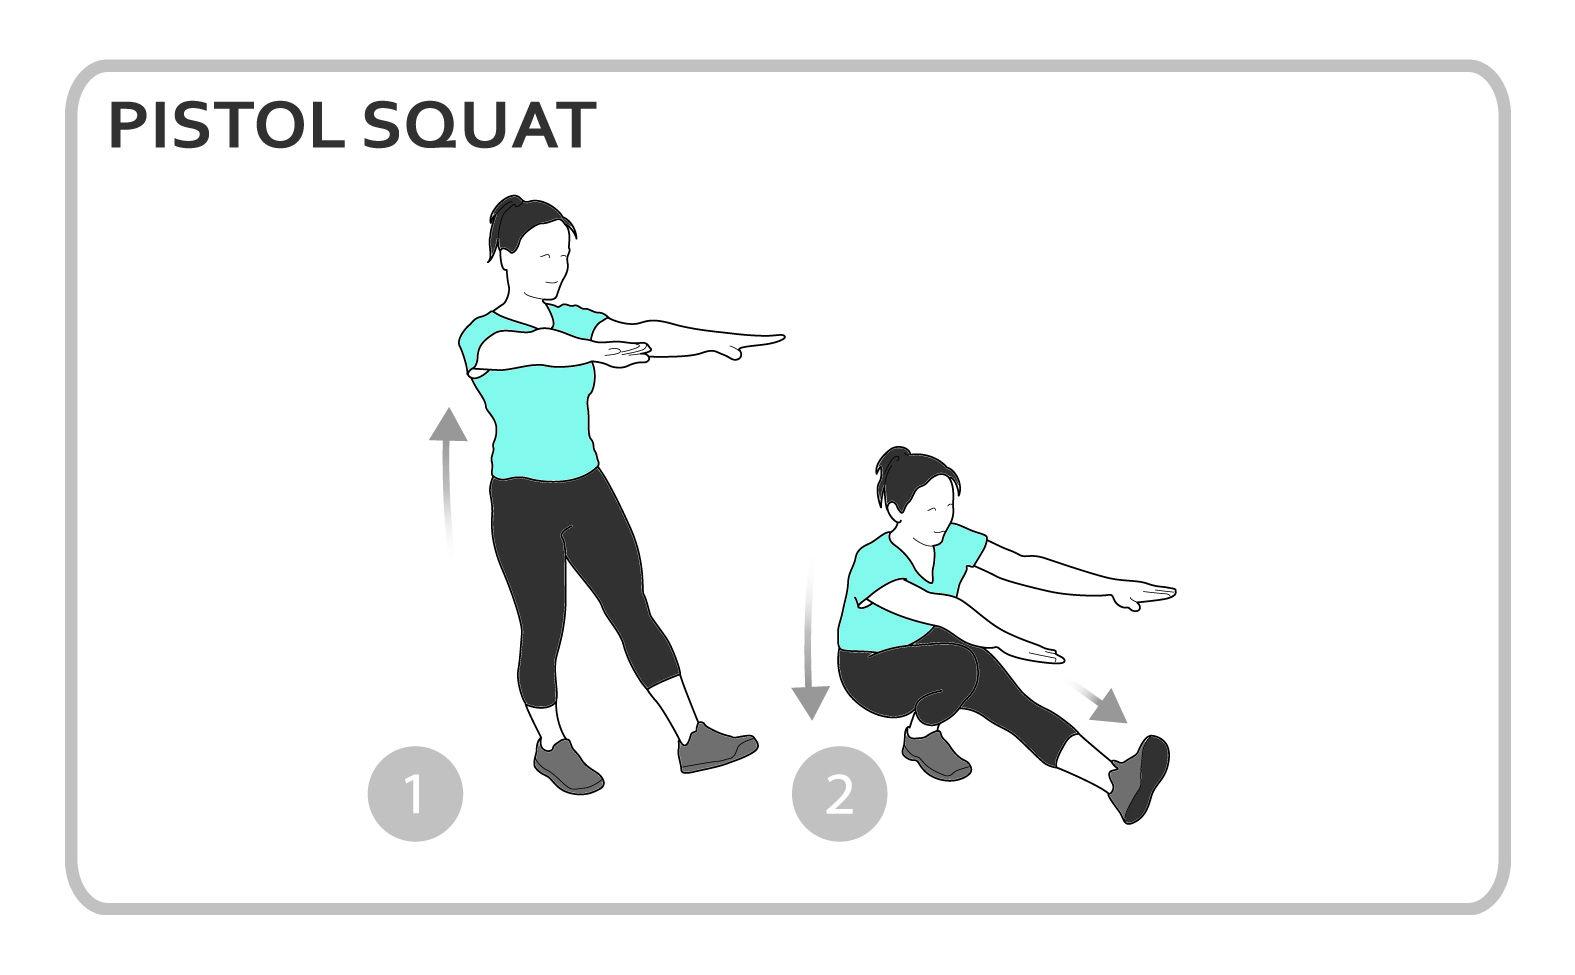 Pistol Squat Exercise Diagram Lower Body Personal Fitness Workout Squat Workout Workout Exercise